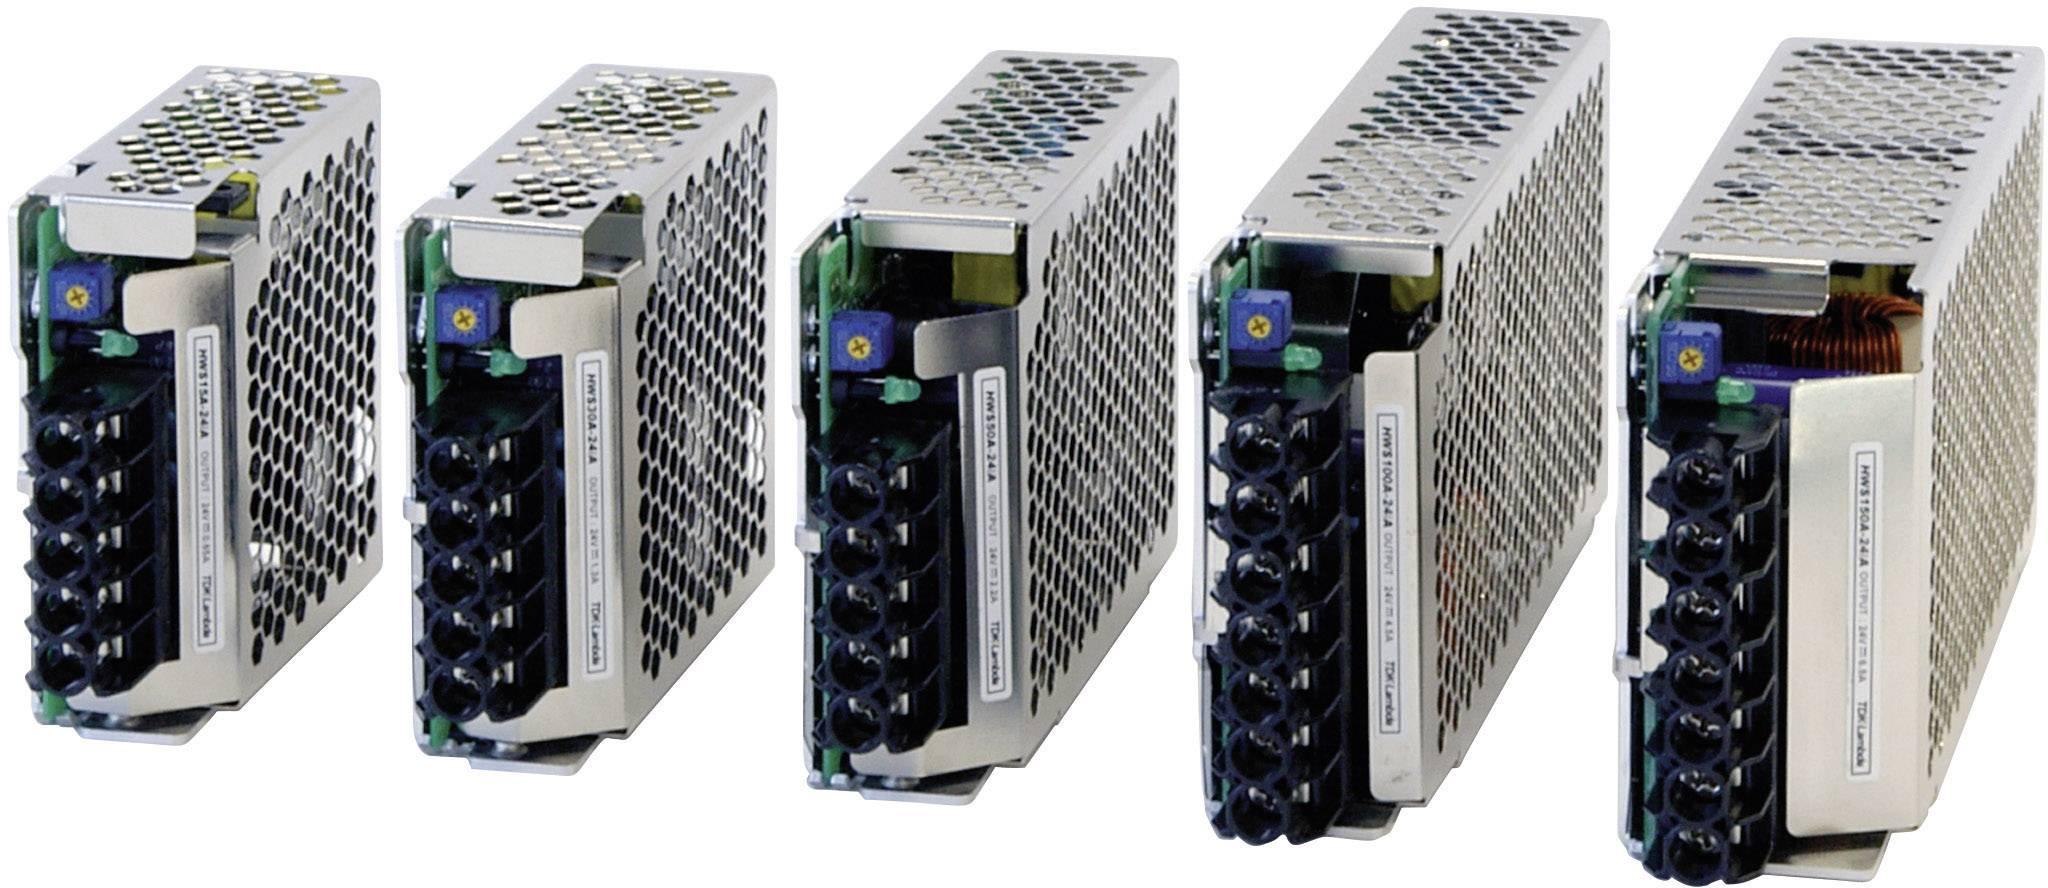 Zabudovateľný napájací zdroj TDK-Lambda HWS-50A-24, 24 V, 52,8 W